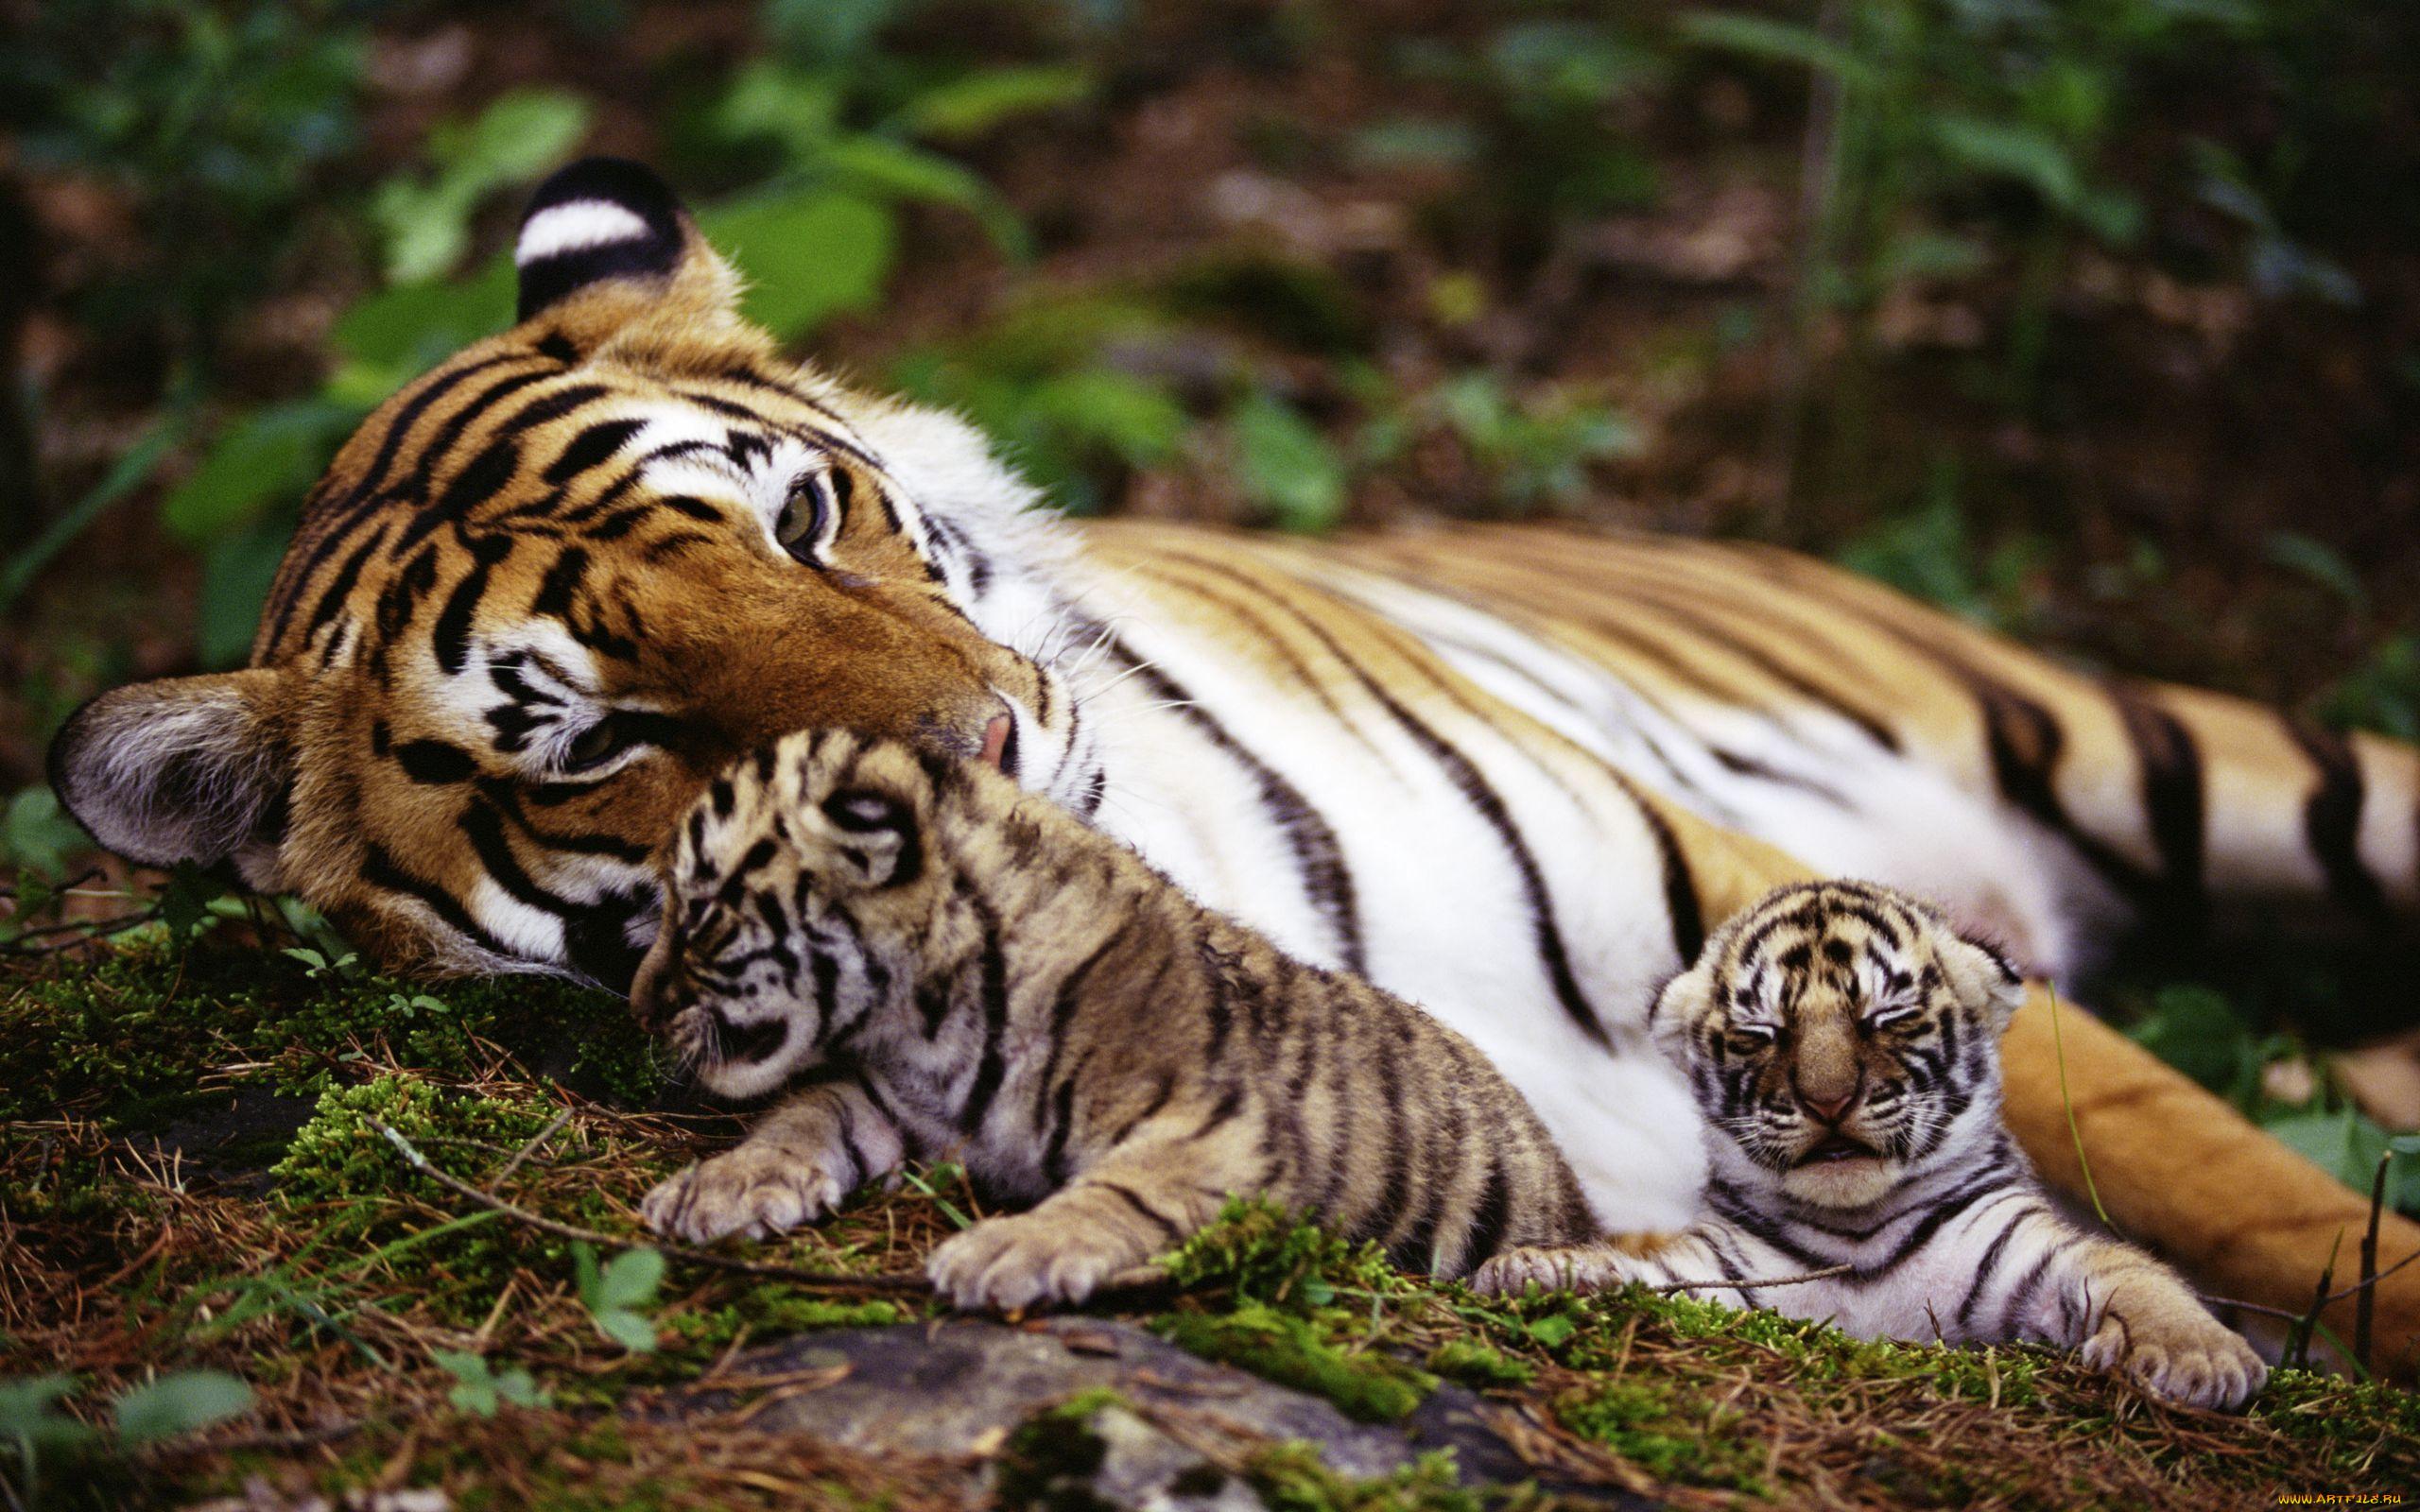 природа животные тигры nature animals tigers  № 1297238 бесплатно